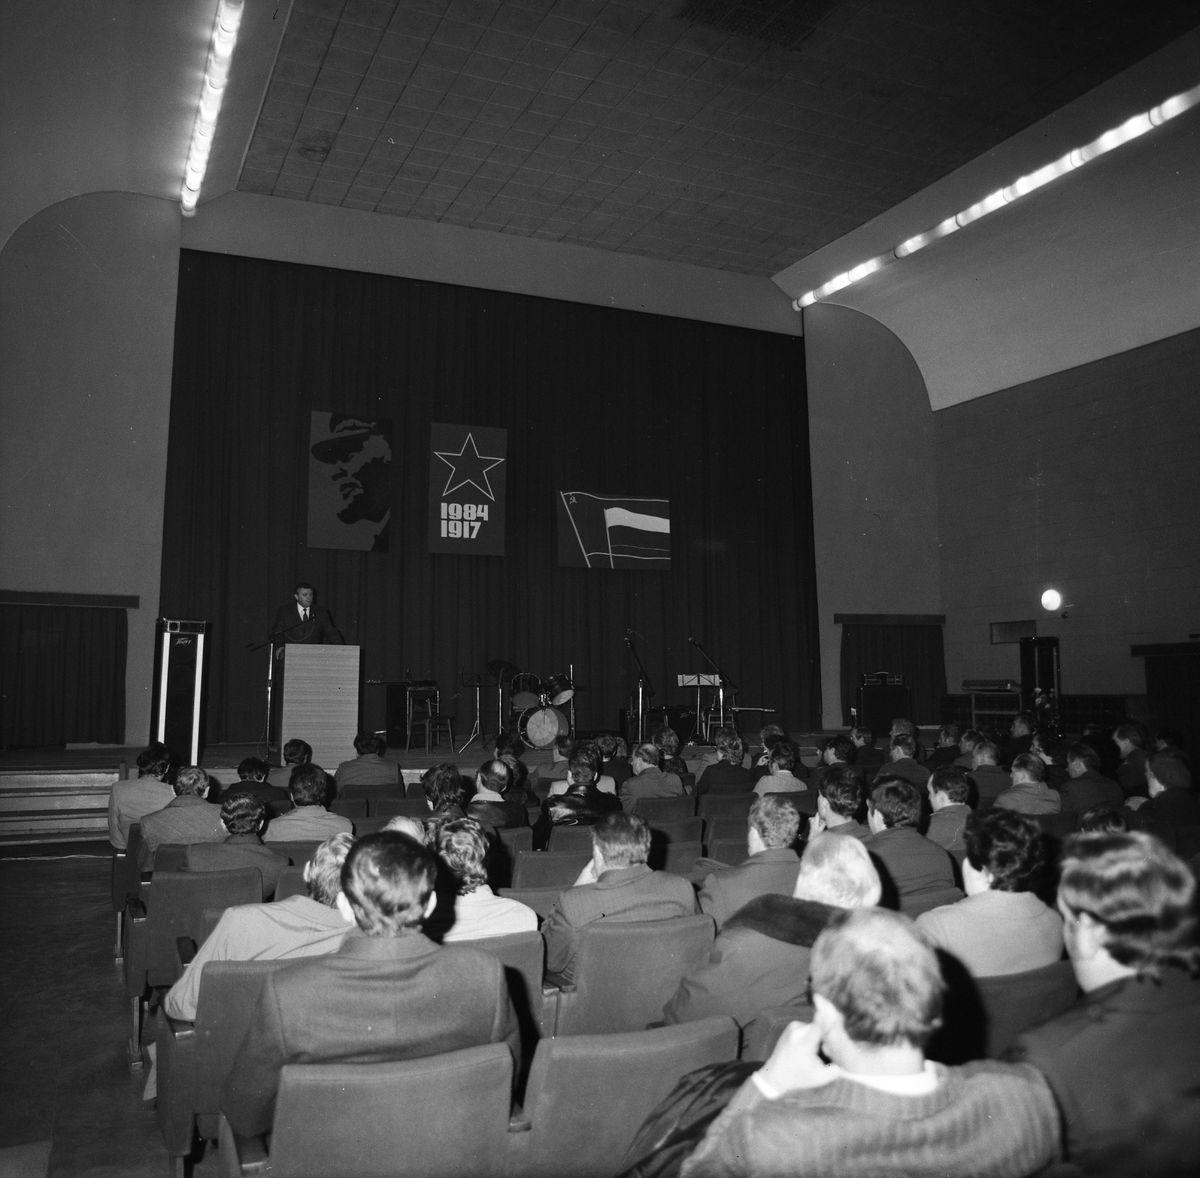 Wizyta konsula ZSRR [6]